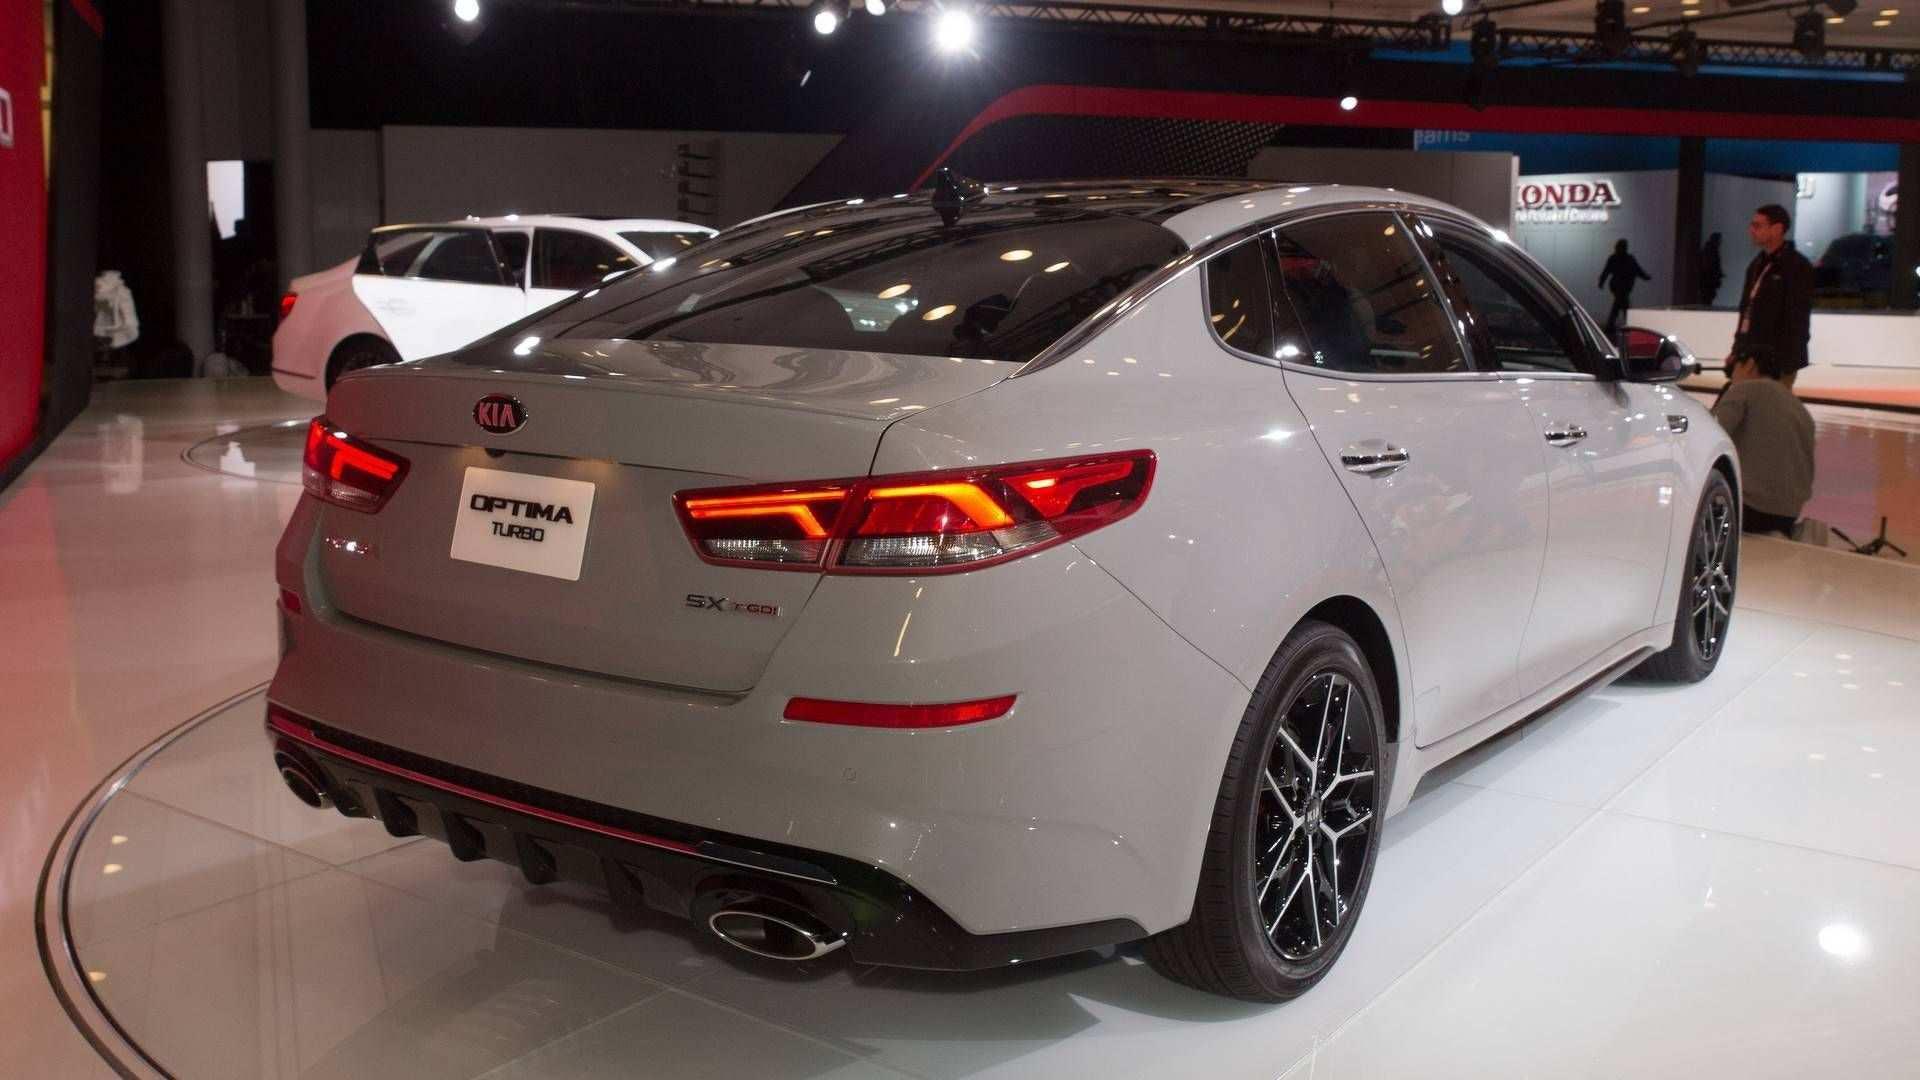 24 All New Kia Optima 2020 New Concept Redesign and Concept for Kia Optima 2020 New Concept